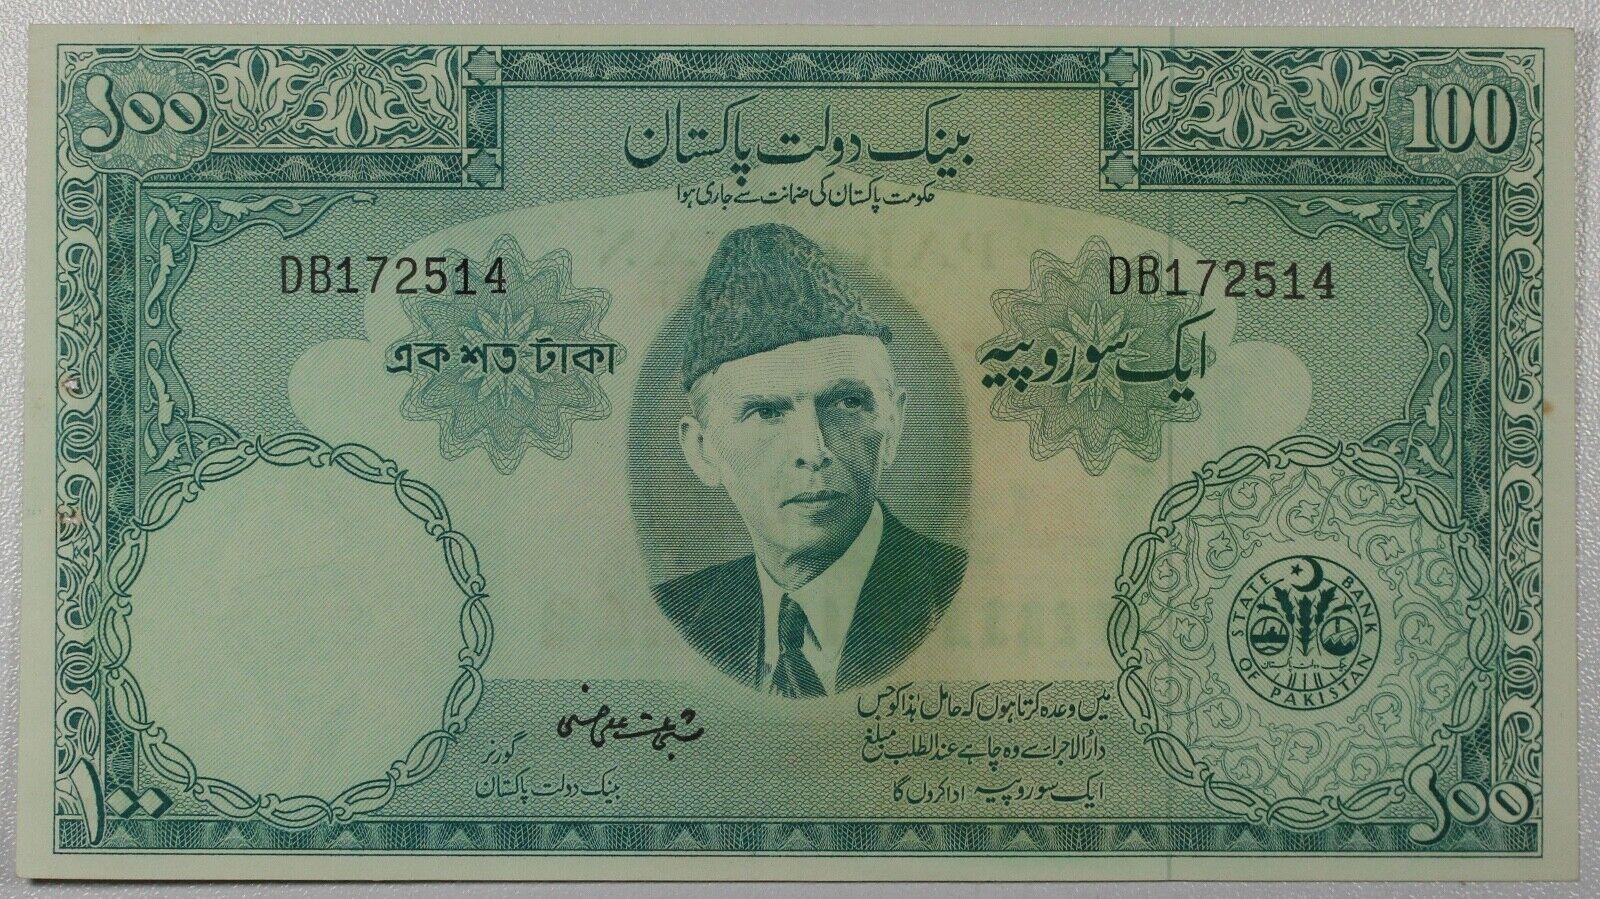 1957-1967 Pakistan 100 Rupees p-18a ND UNC Banknote 1